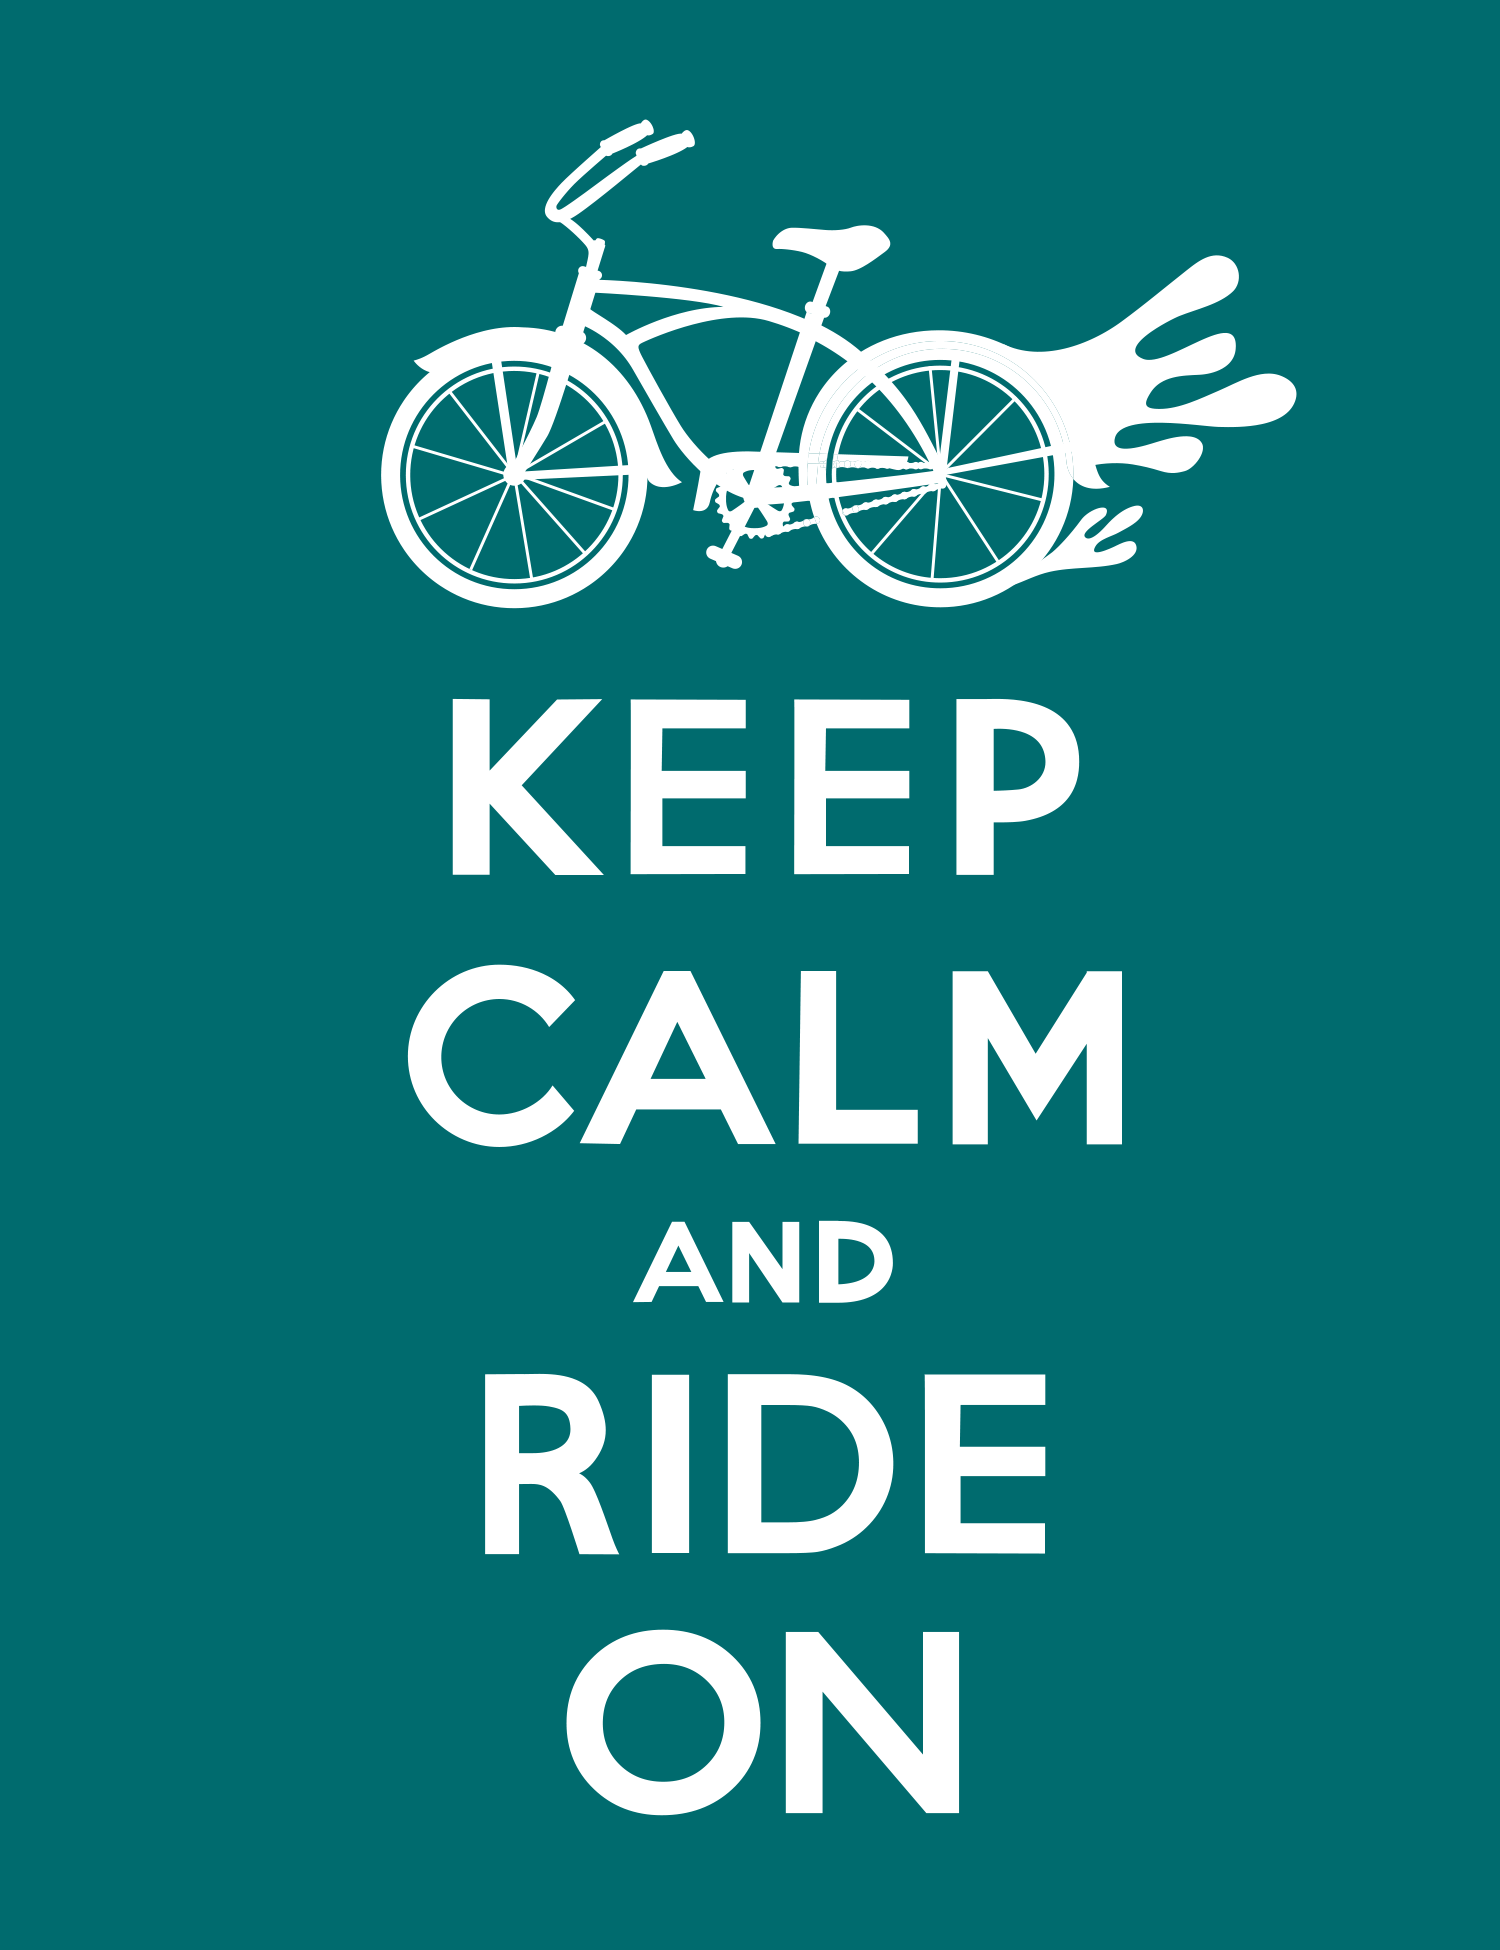 keep calm_ride_on_green_andi_bird.png